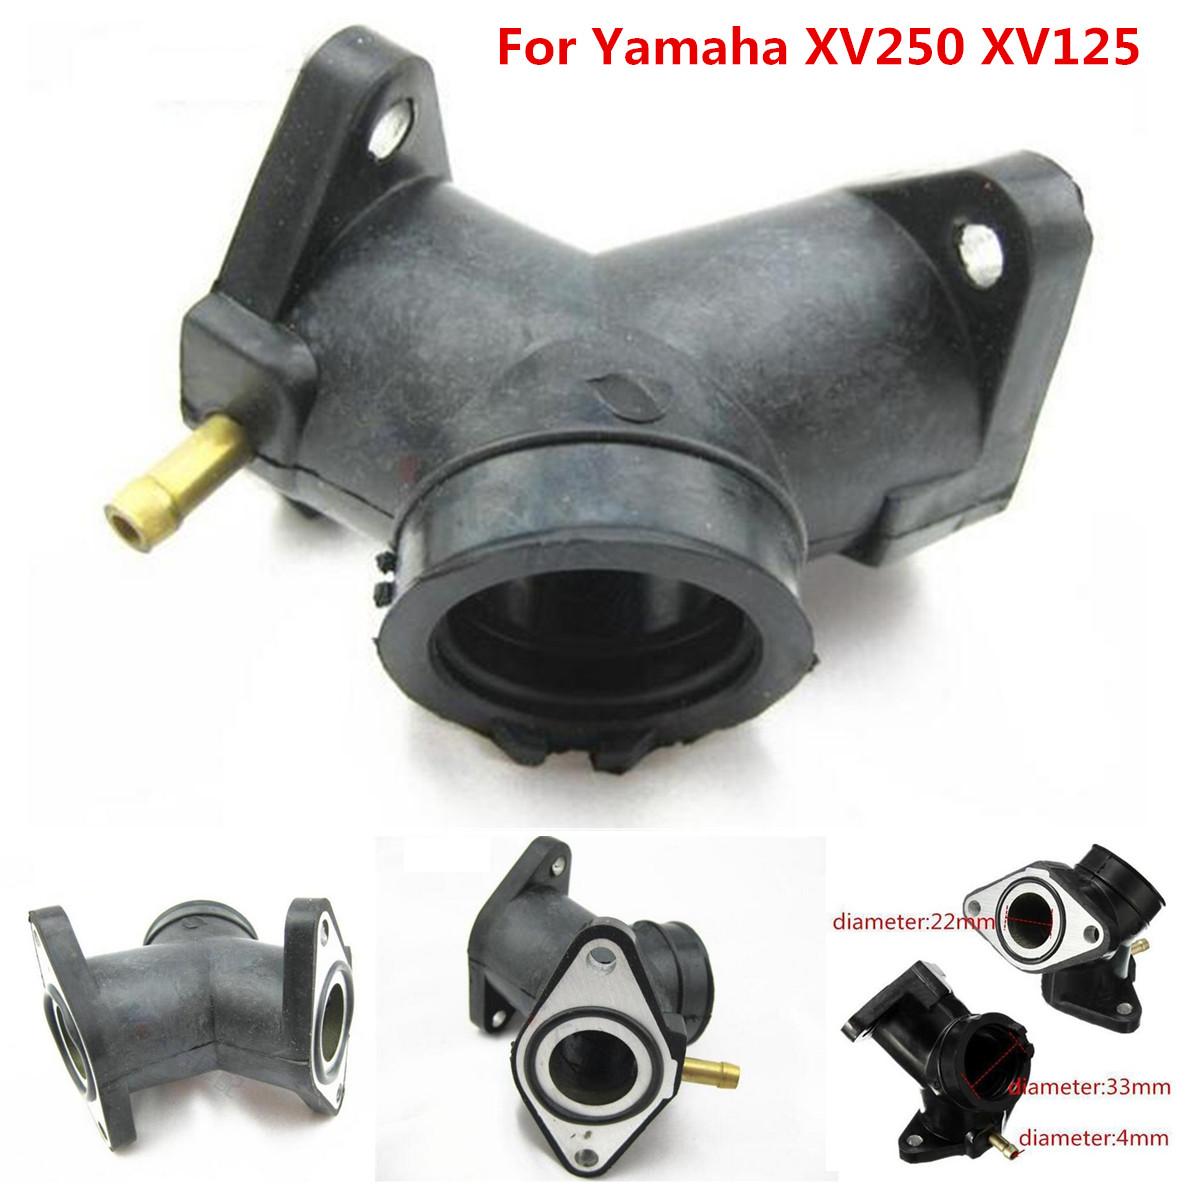 Intake Carburetor Interface For Yamaha Virago XV125 Glue Joint Boot